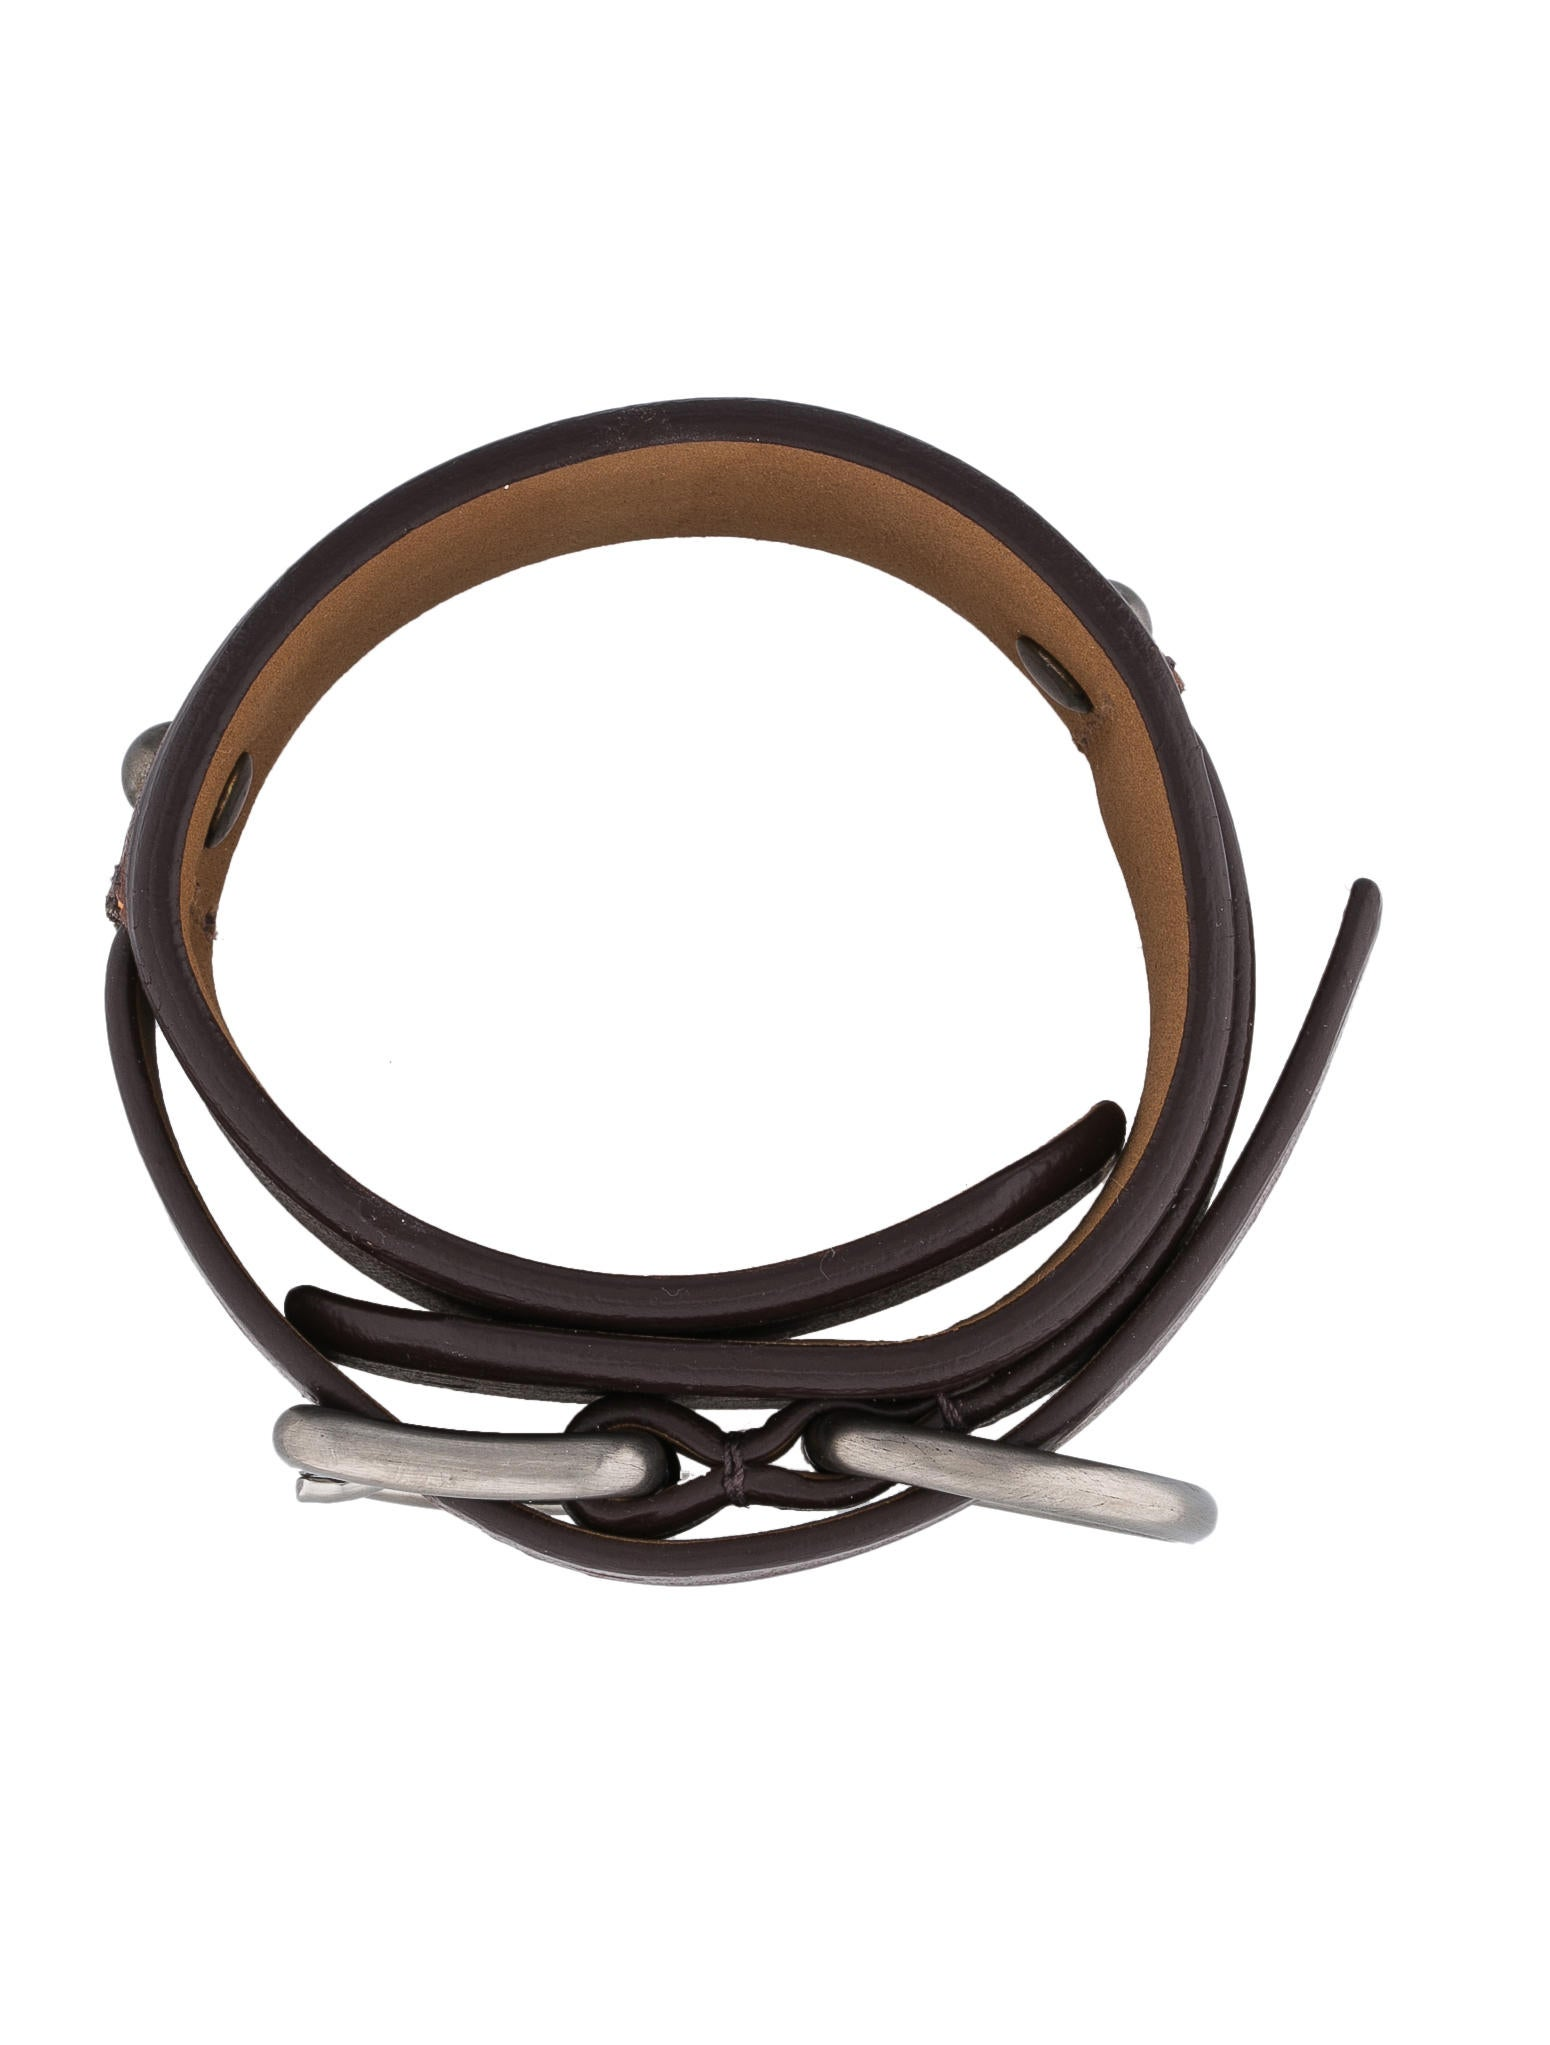 prada mini hobo bag - Prada Leather Bracelet - Mens Jewelry - 0PR21415 | The RealReal